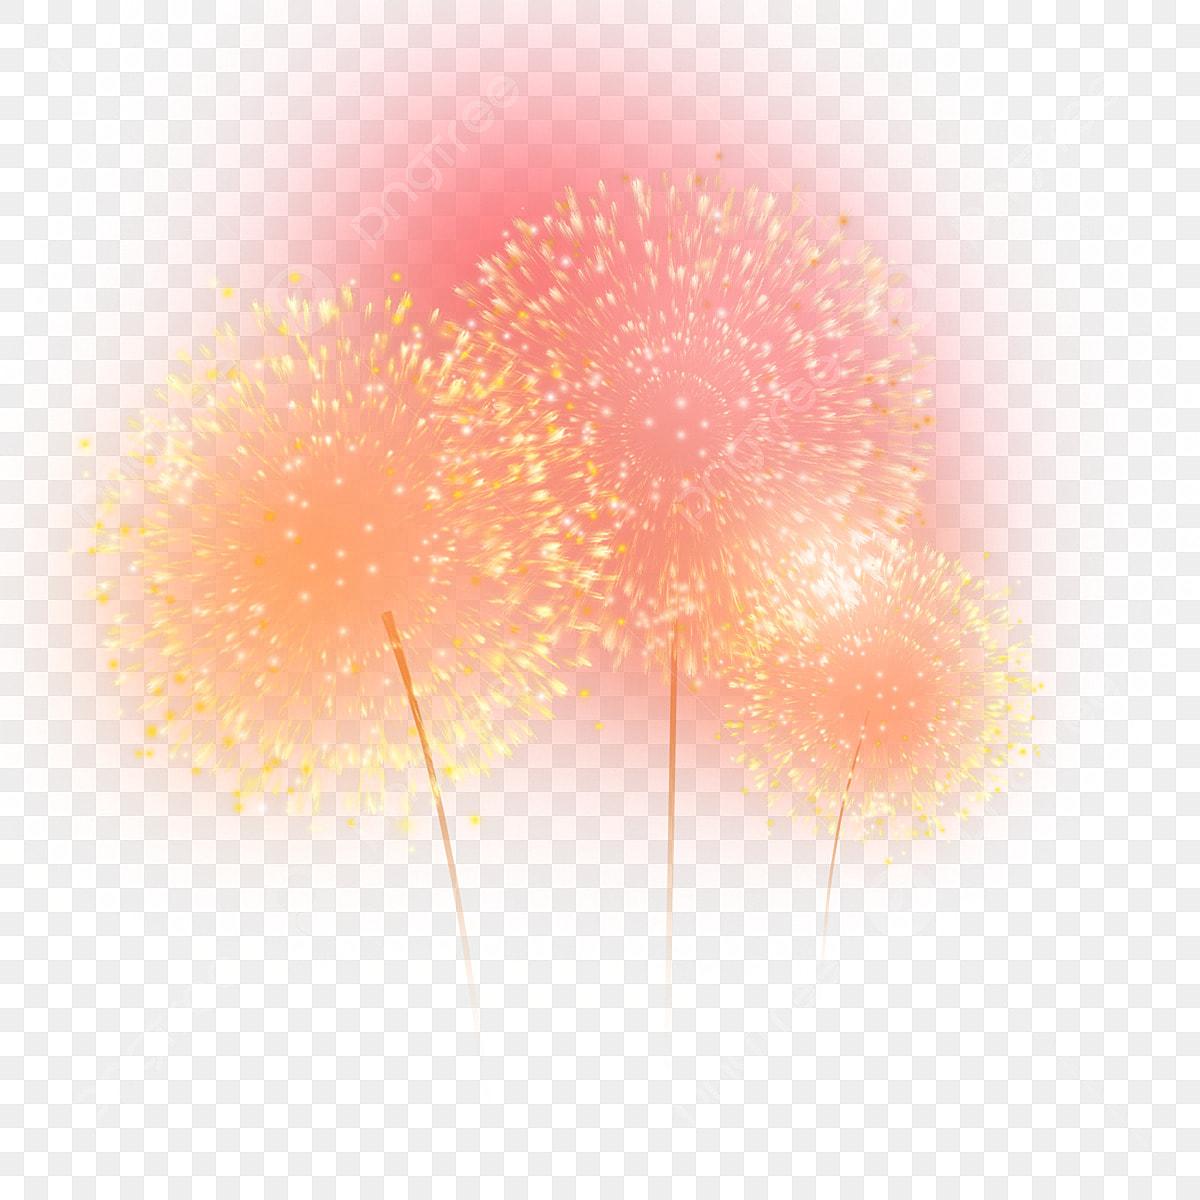 Fireworks Fireworks Orange Fireworks Salam Bunga Api Yang